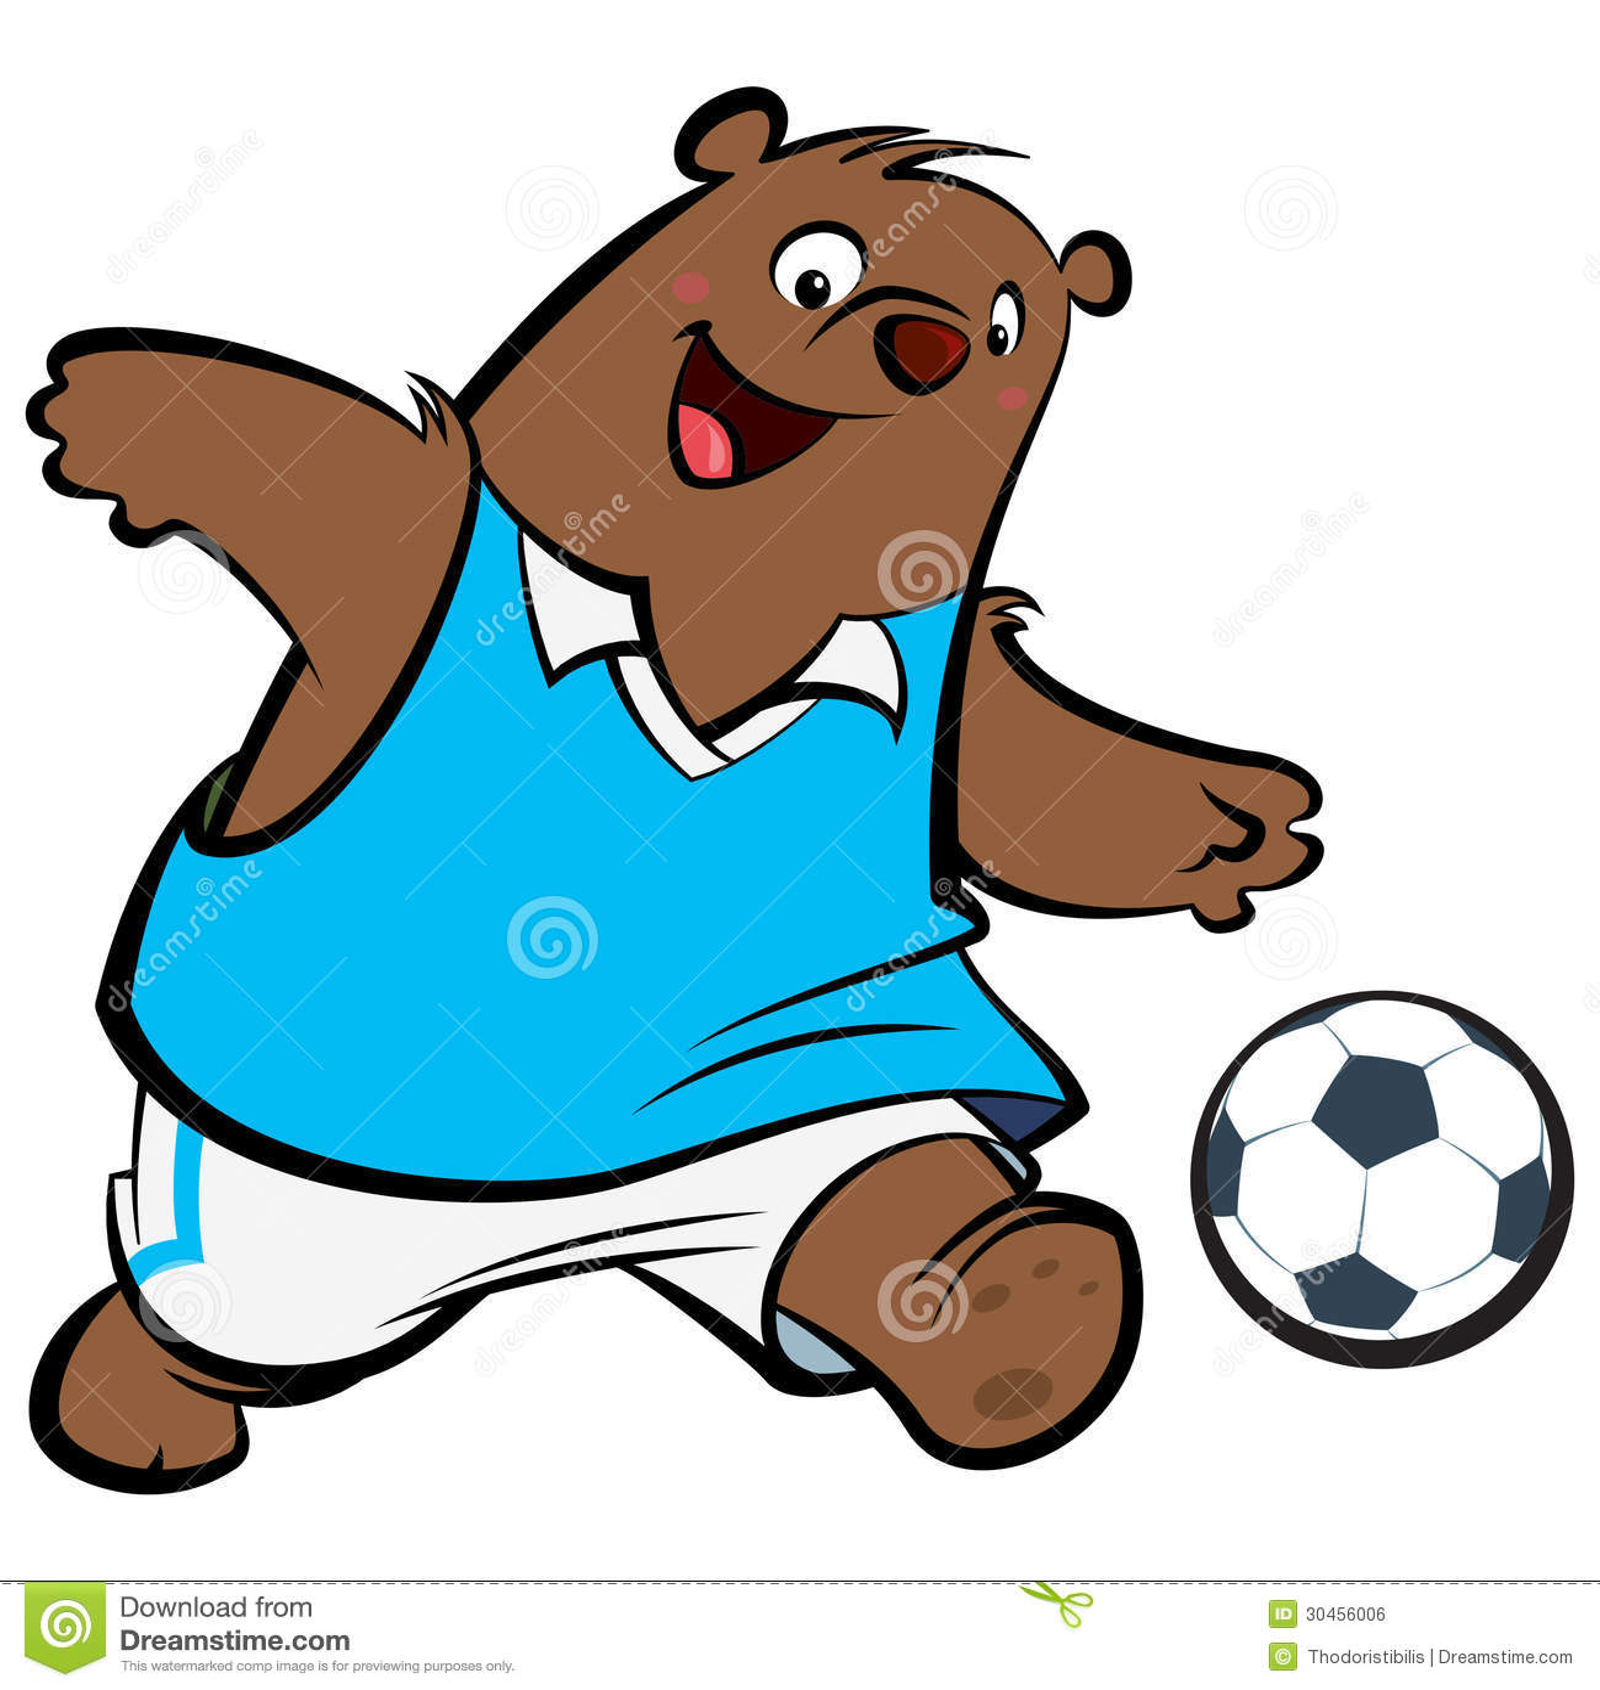 Cartoon Bear Football Player Stock Vector - Image: 30456006